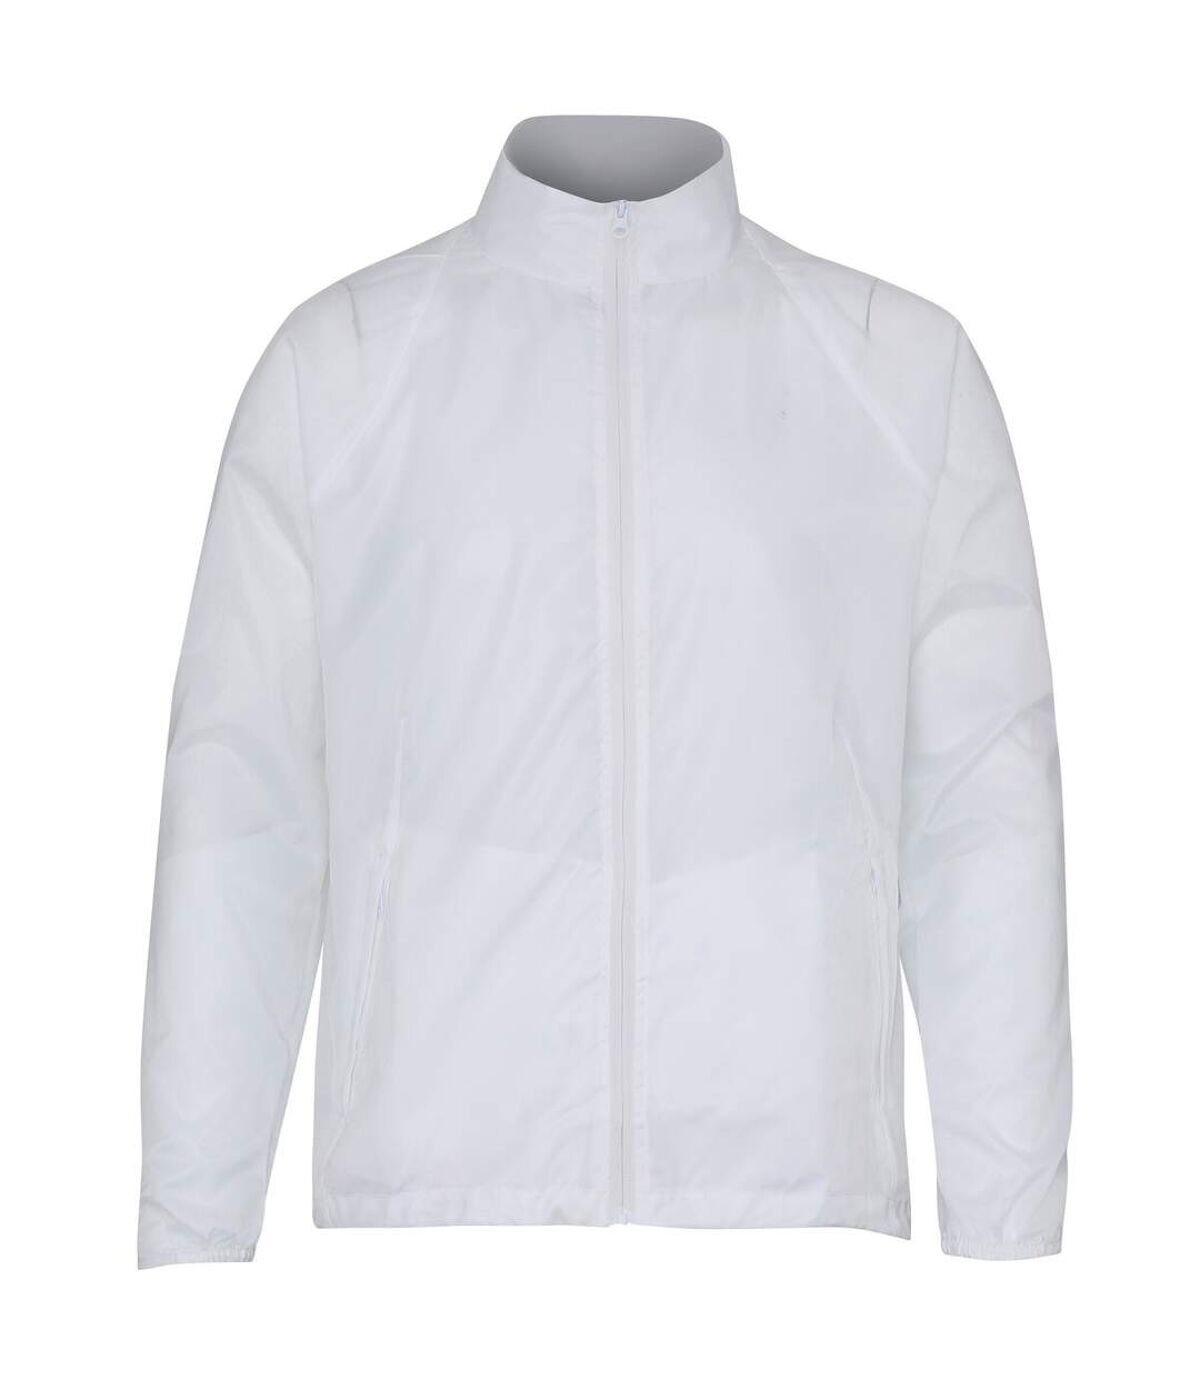 2786 Unisex Lightweight Plain Wind & Shower Resistant Jacket (Kelly) - UTRW2500